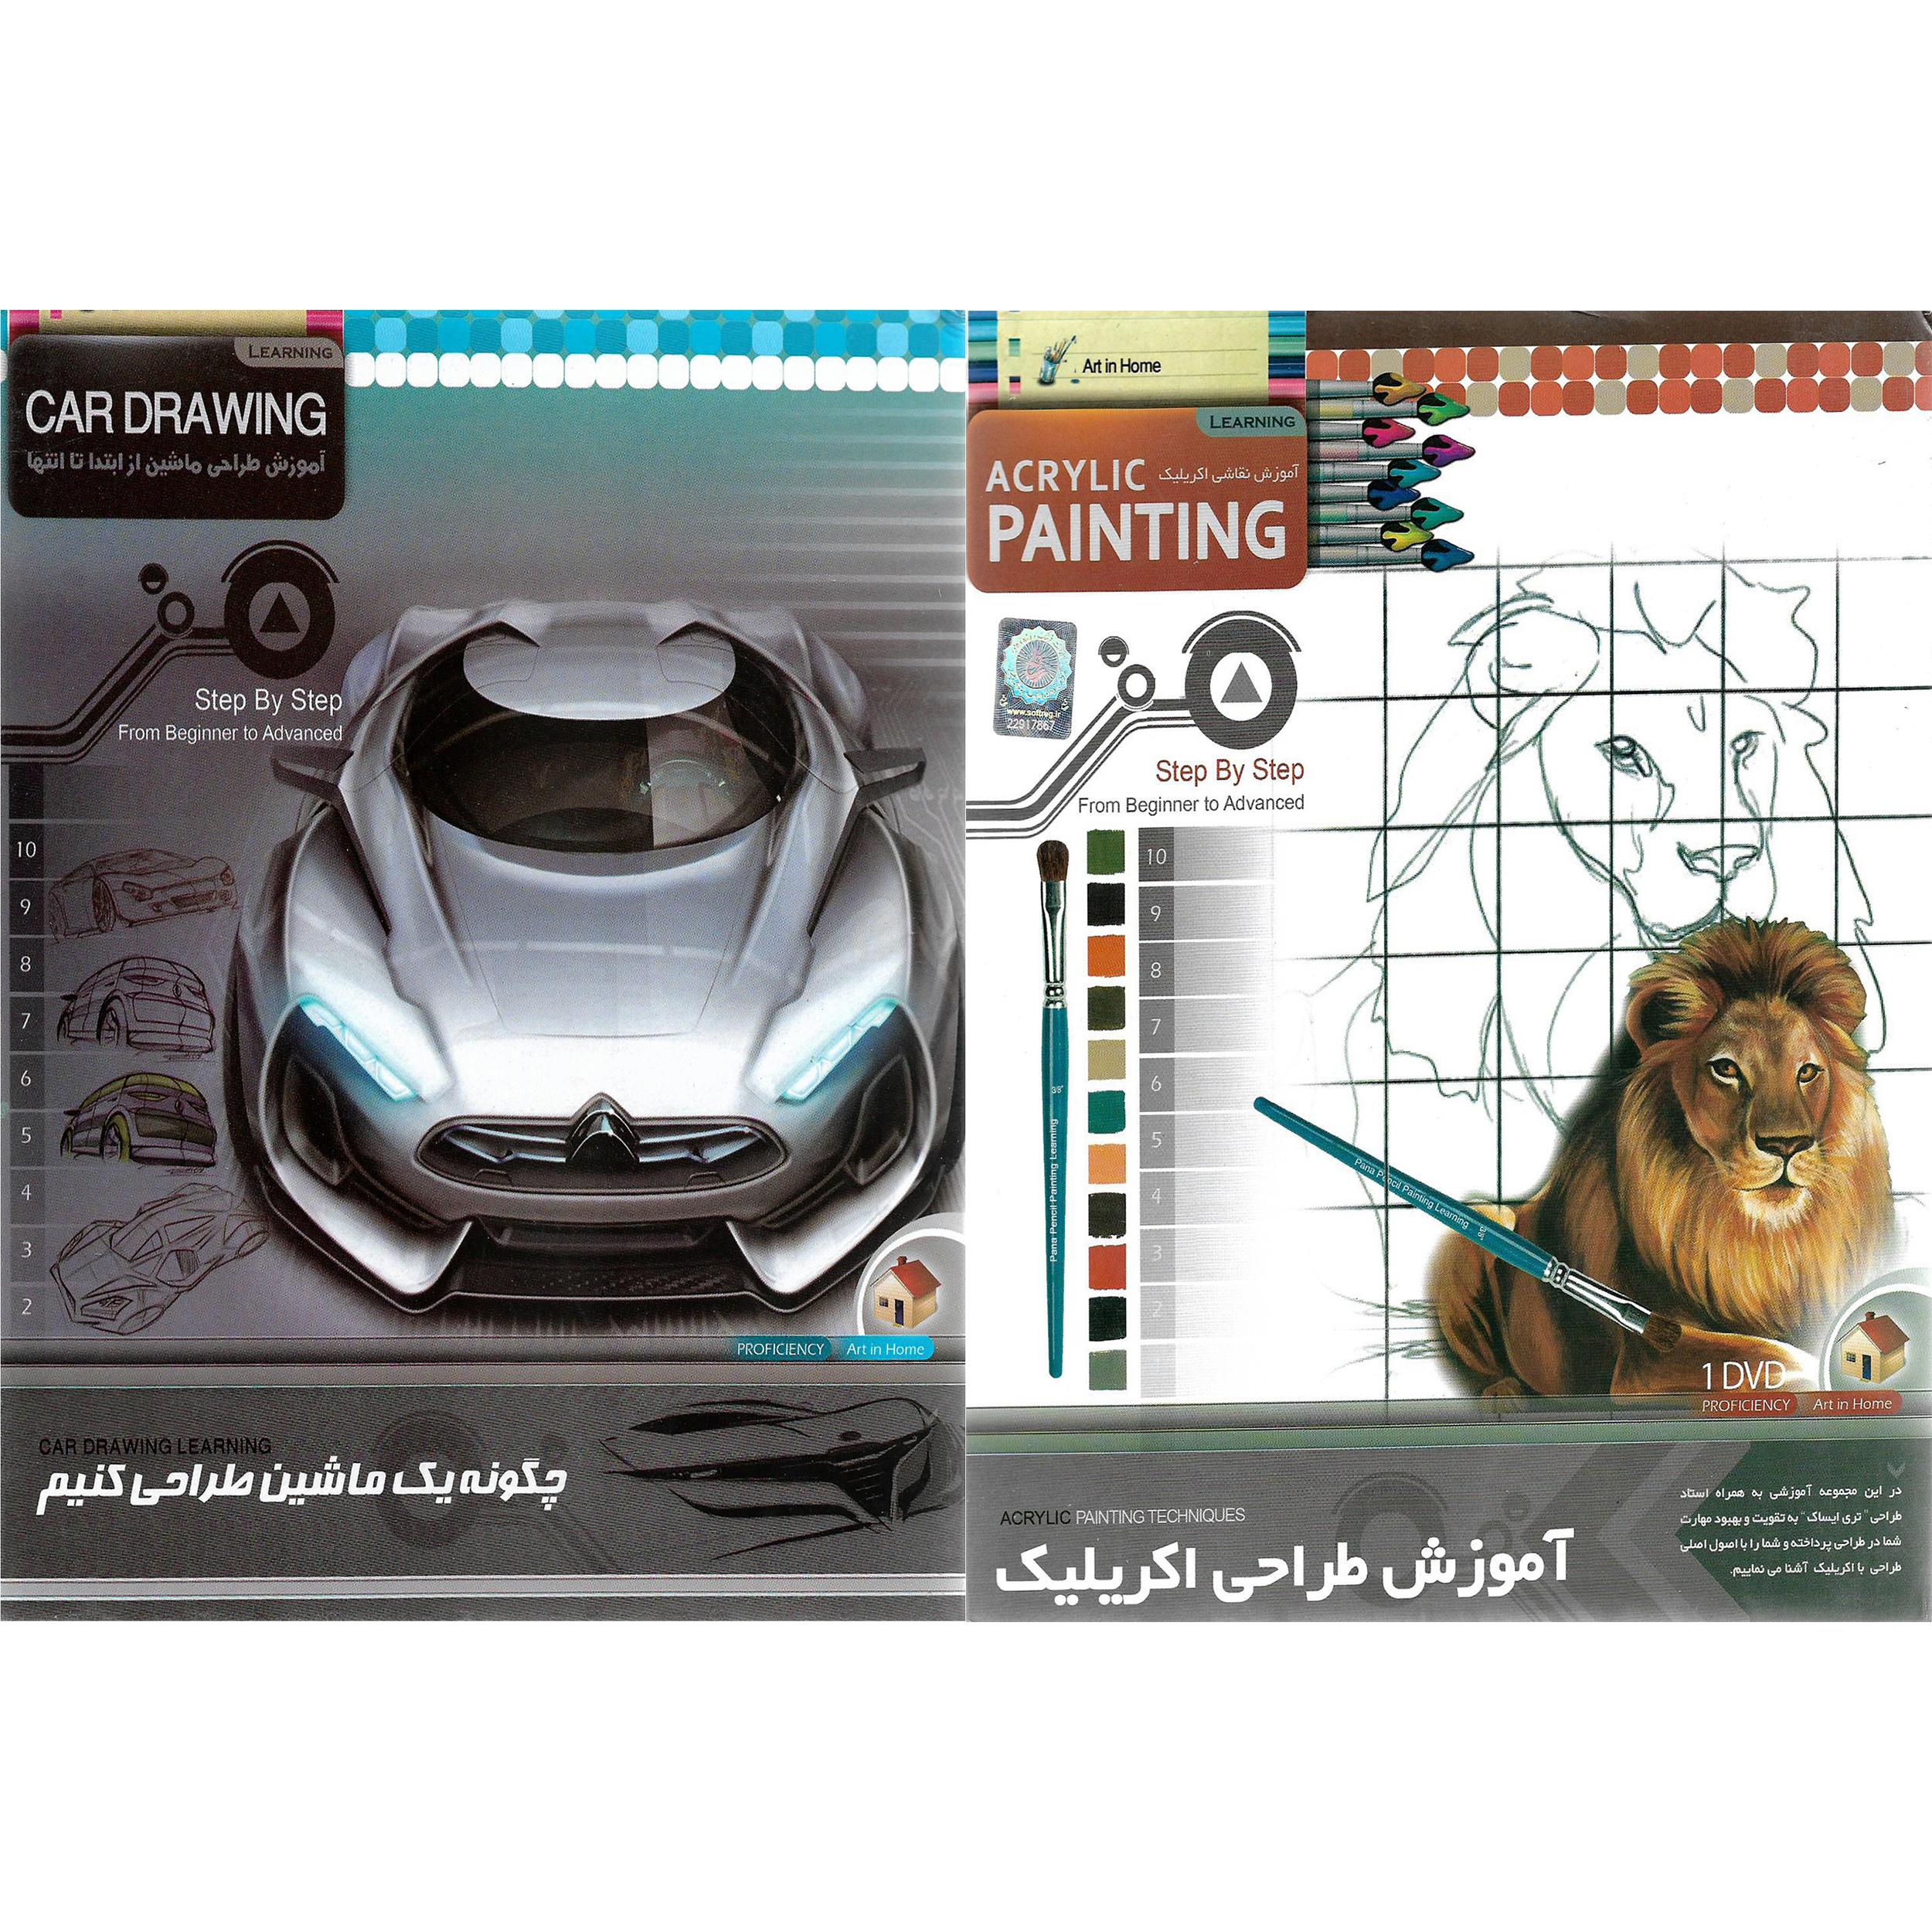 نرم افزار آموزش طراحی اکریلیک نشر پانا به همراه نرم افزار آموزش چگونه یک ماشین طراحی کنیم نشر پانا